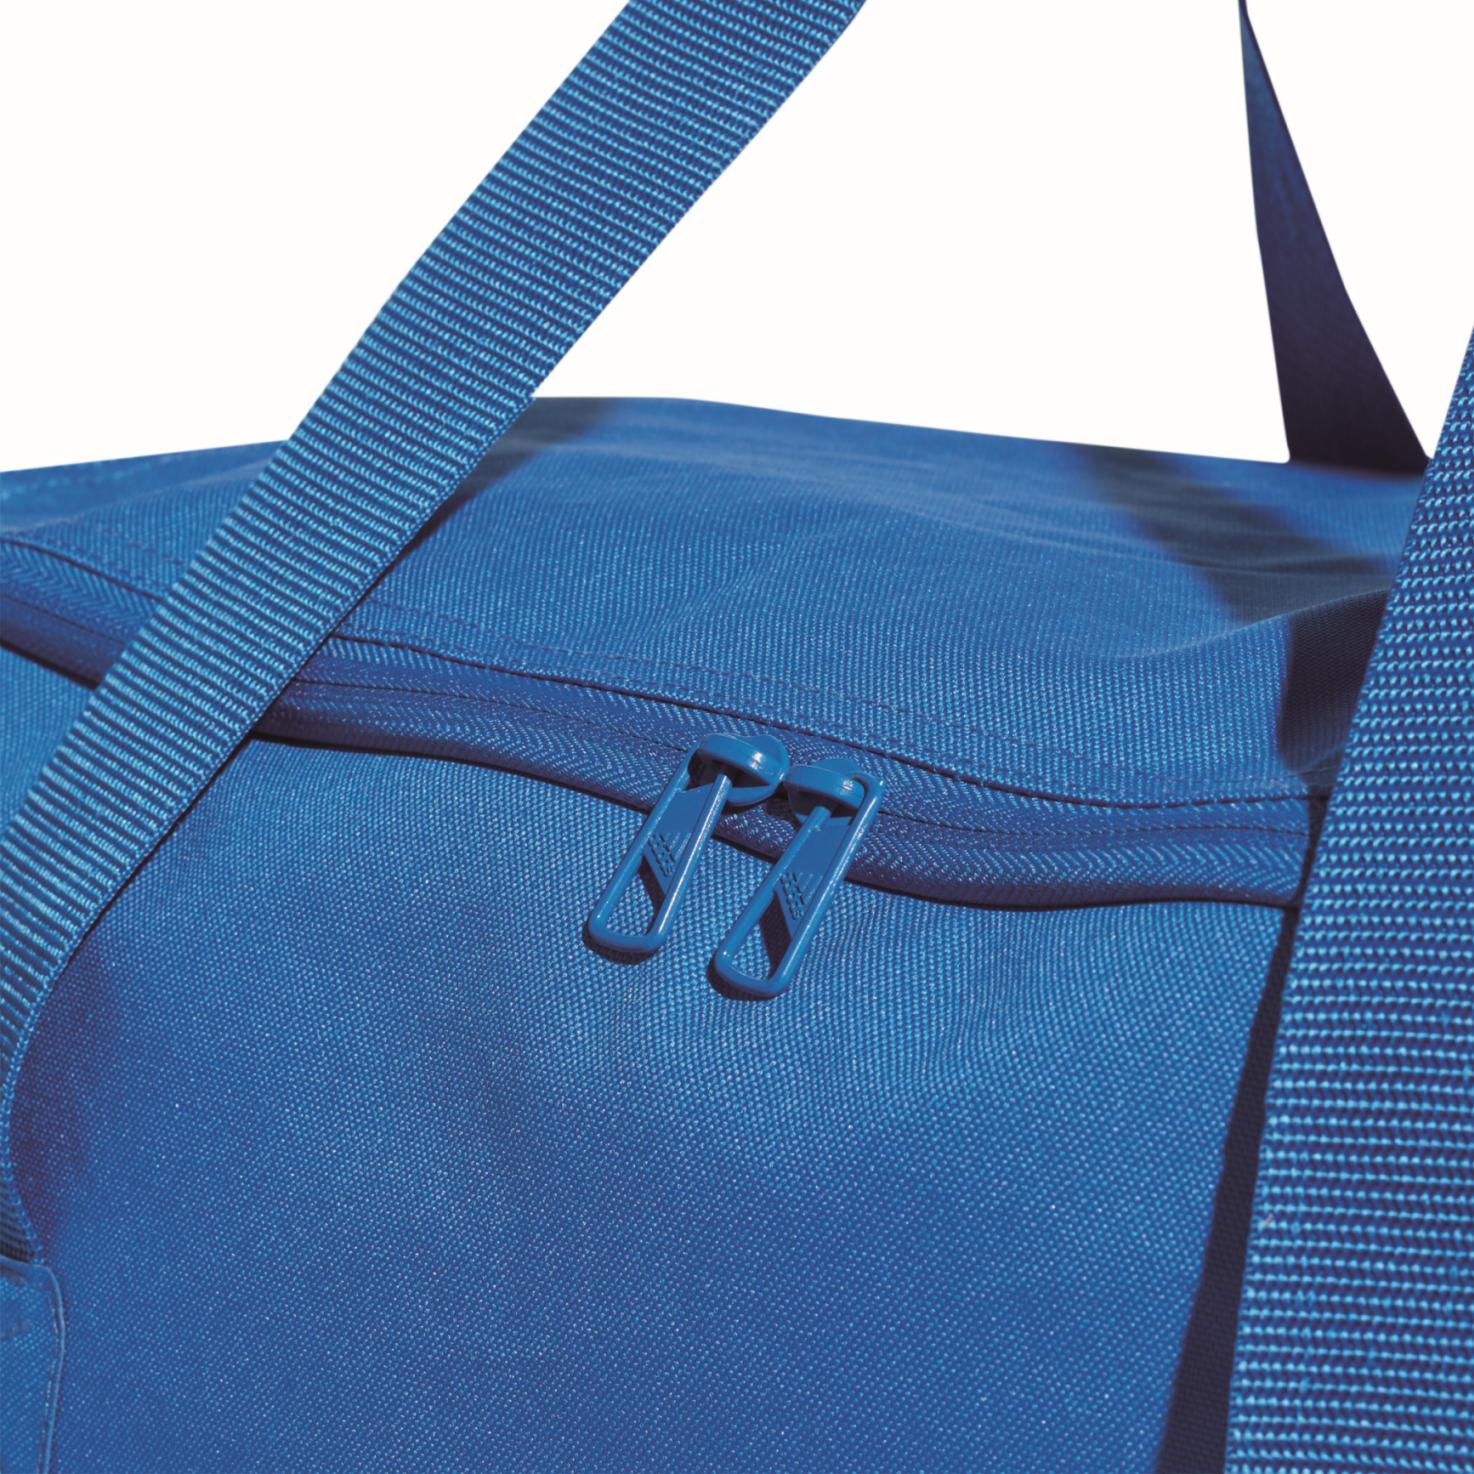 e3de12cd69b9e 10x adidas Tiro Teambag - Medium - Sporttasche mit Bodenfach - BS4752 blau  – Bild 6